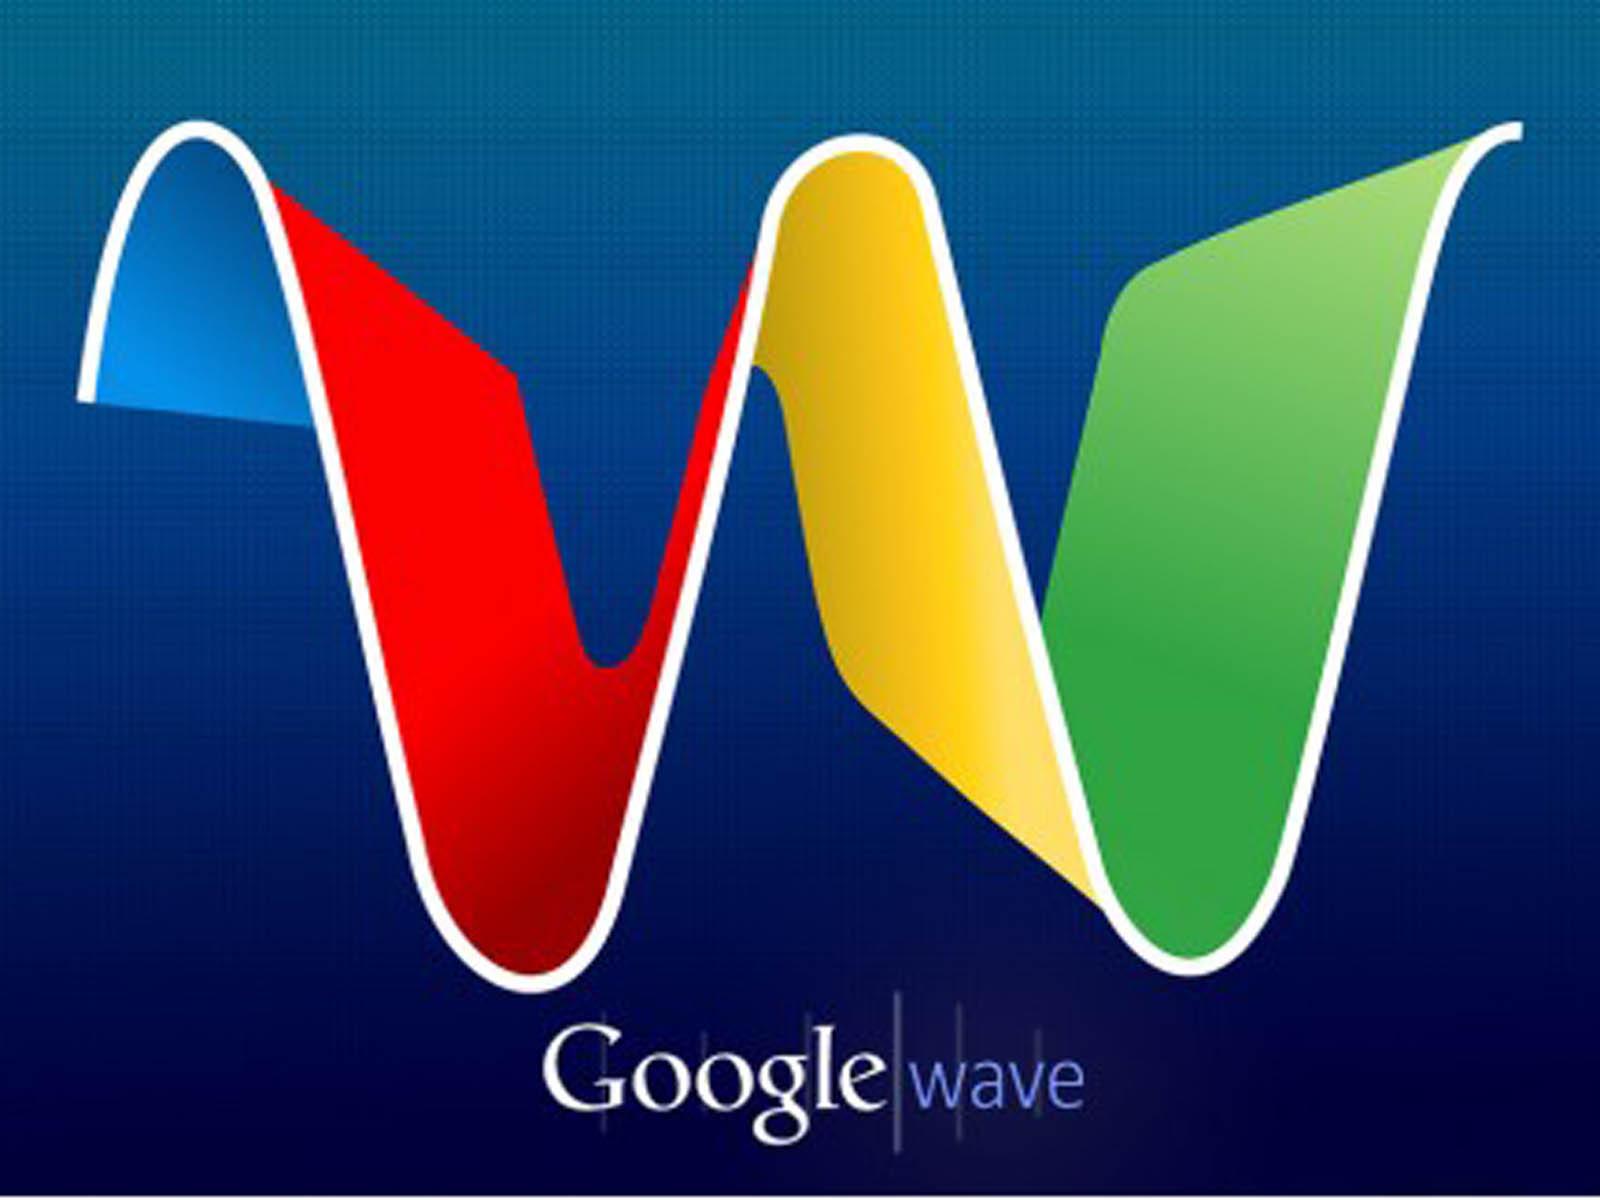 wallpapers: Free Google Desktop Wallpapers